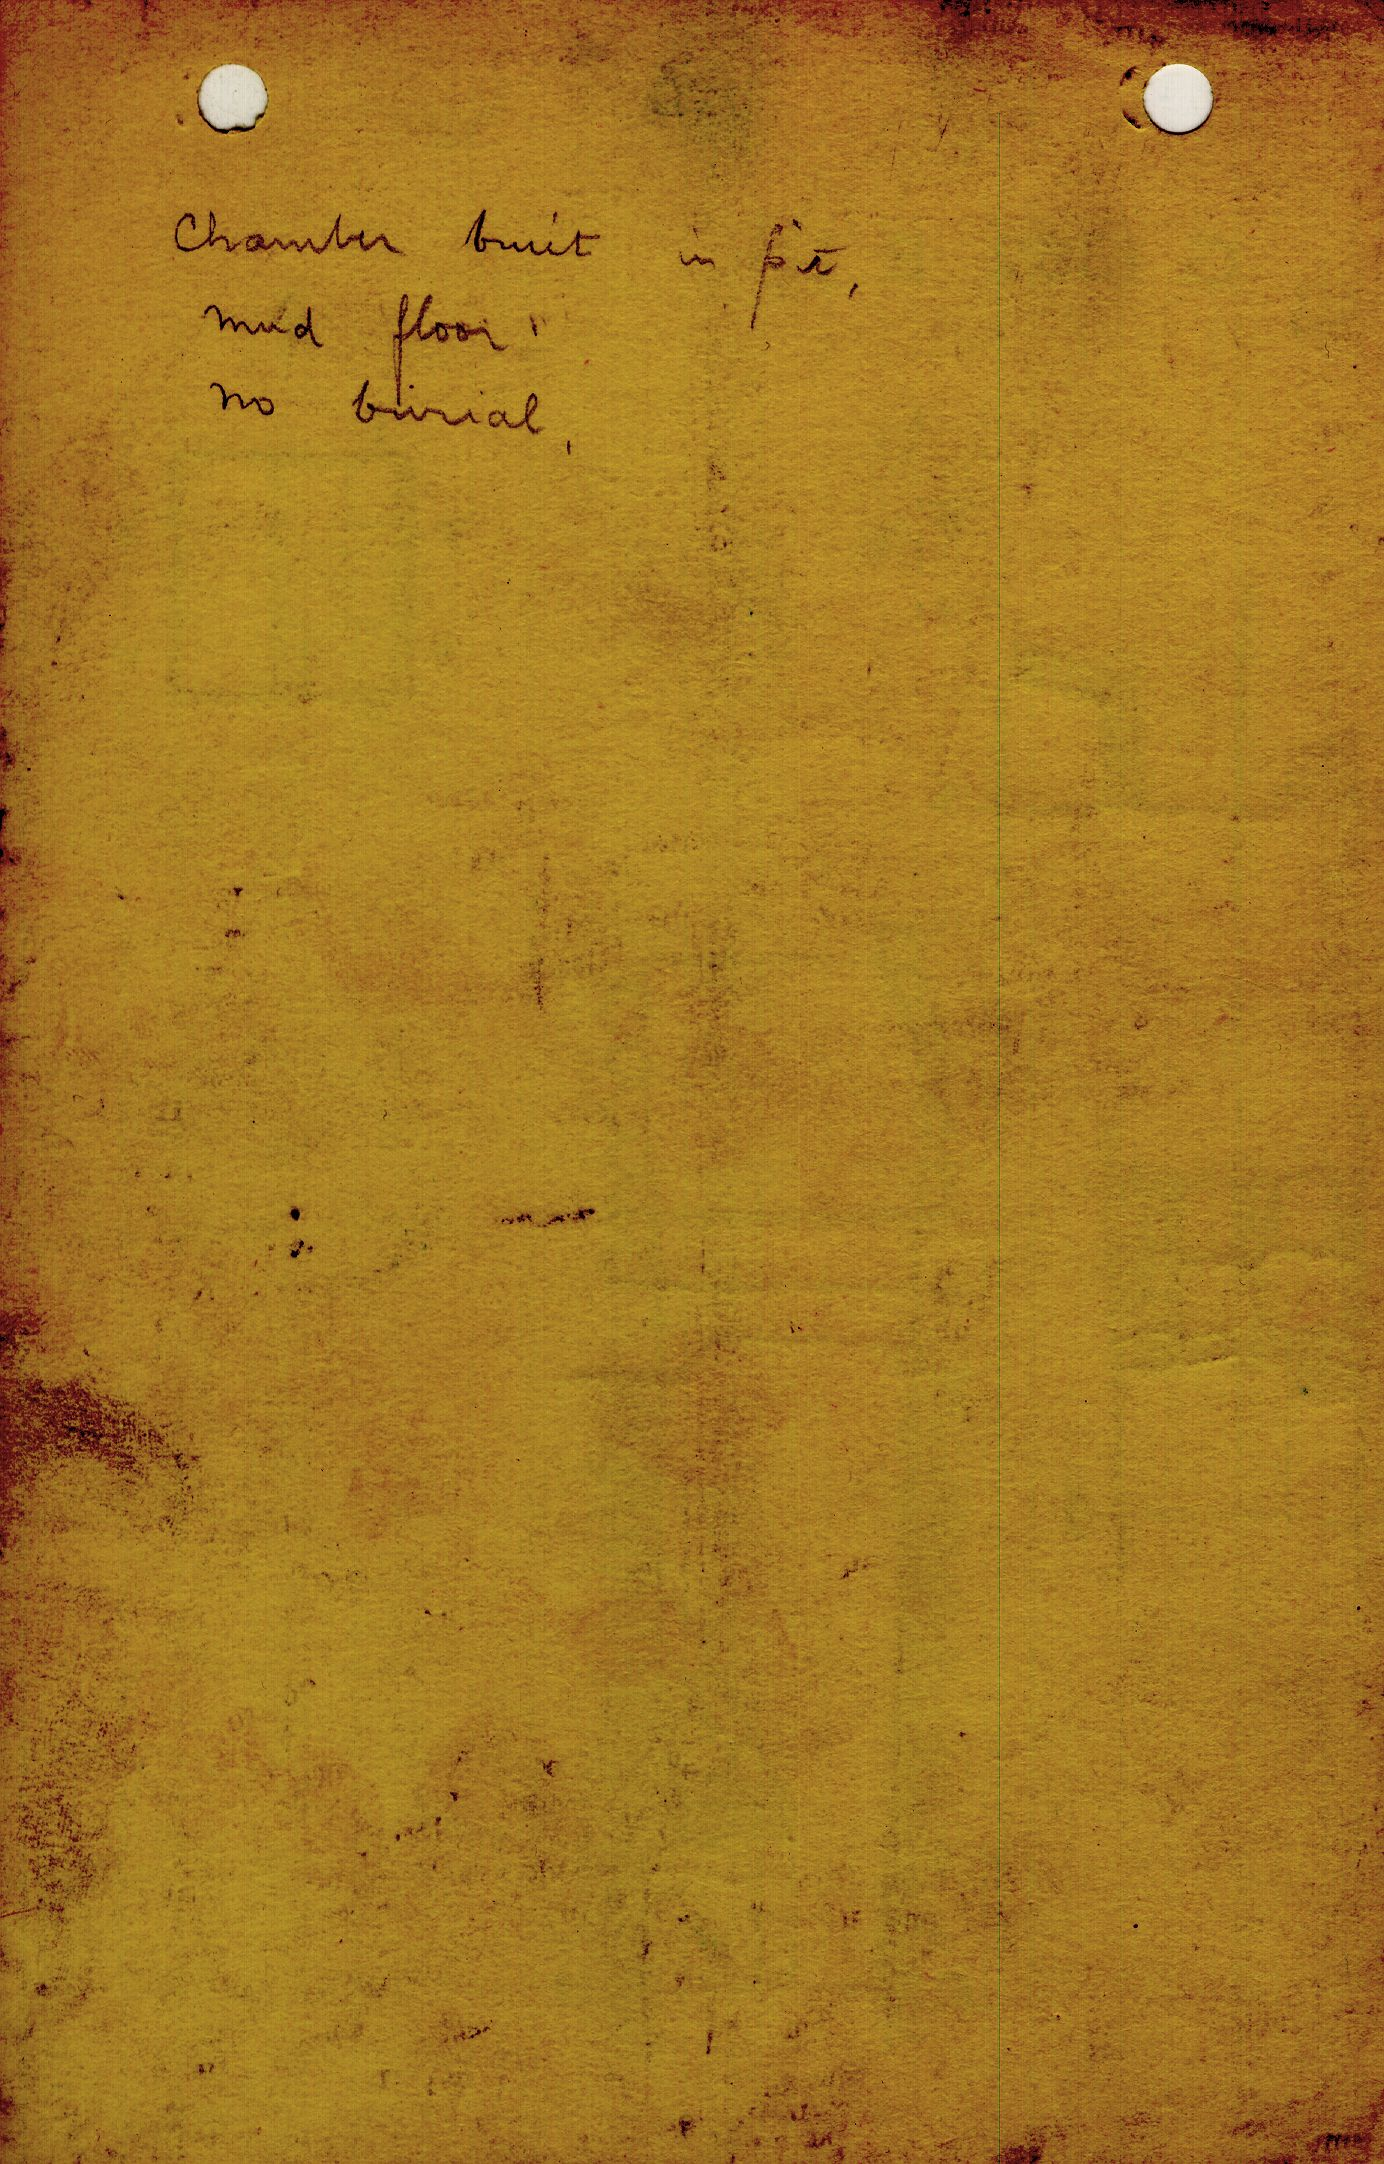 Notes: G 1362, Shaft B (I), notes